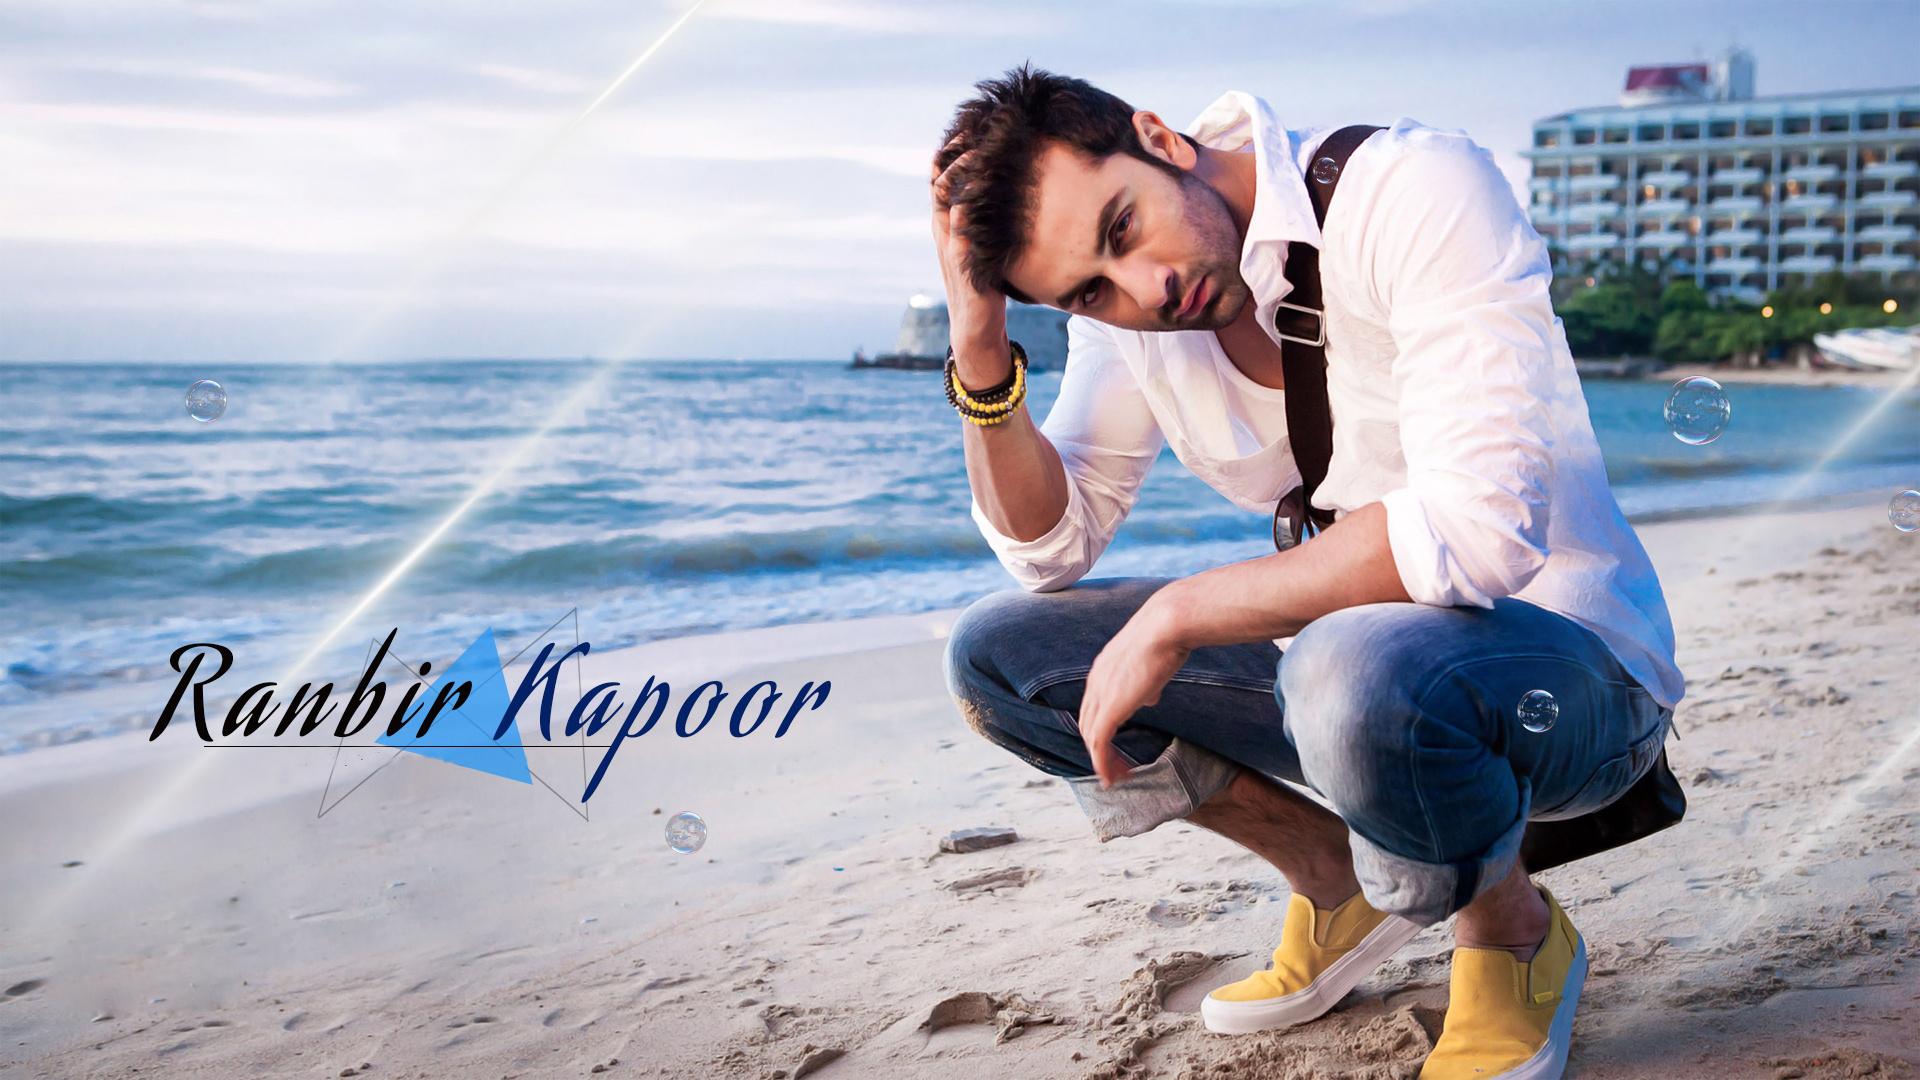 Images of Ranbir Kapoor